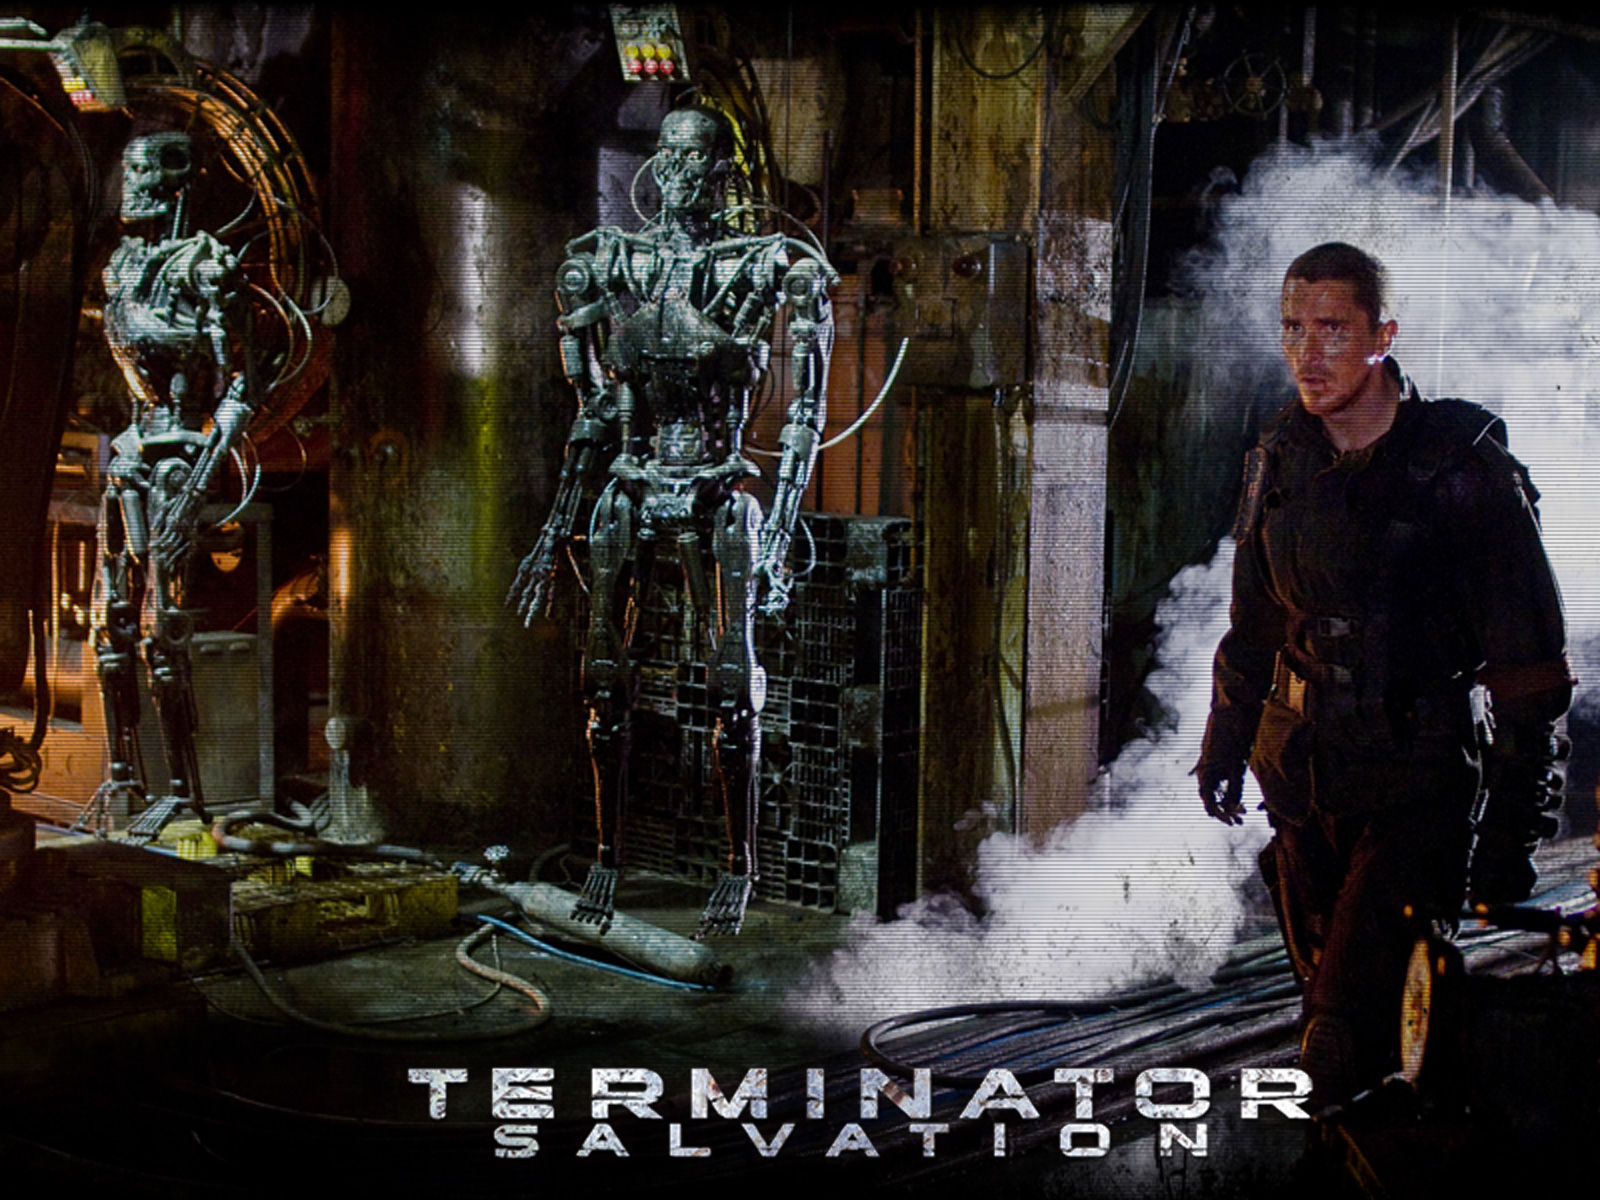 Www New Hd Girl Wallpaper Com John Connor Terminator Salvation Wallpaper 11734883